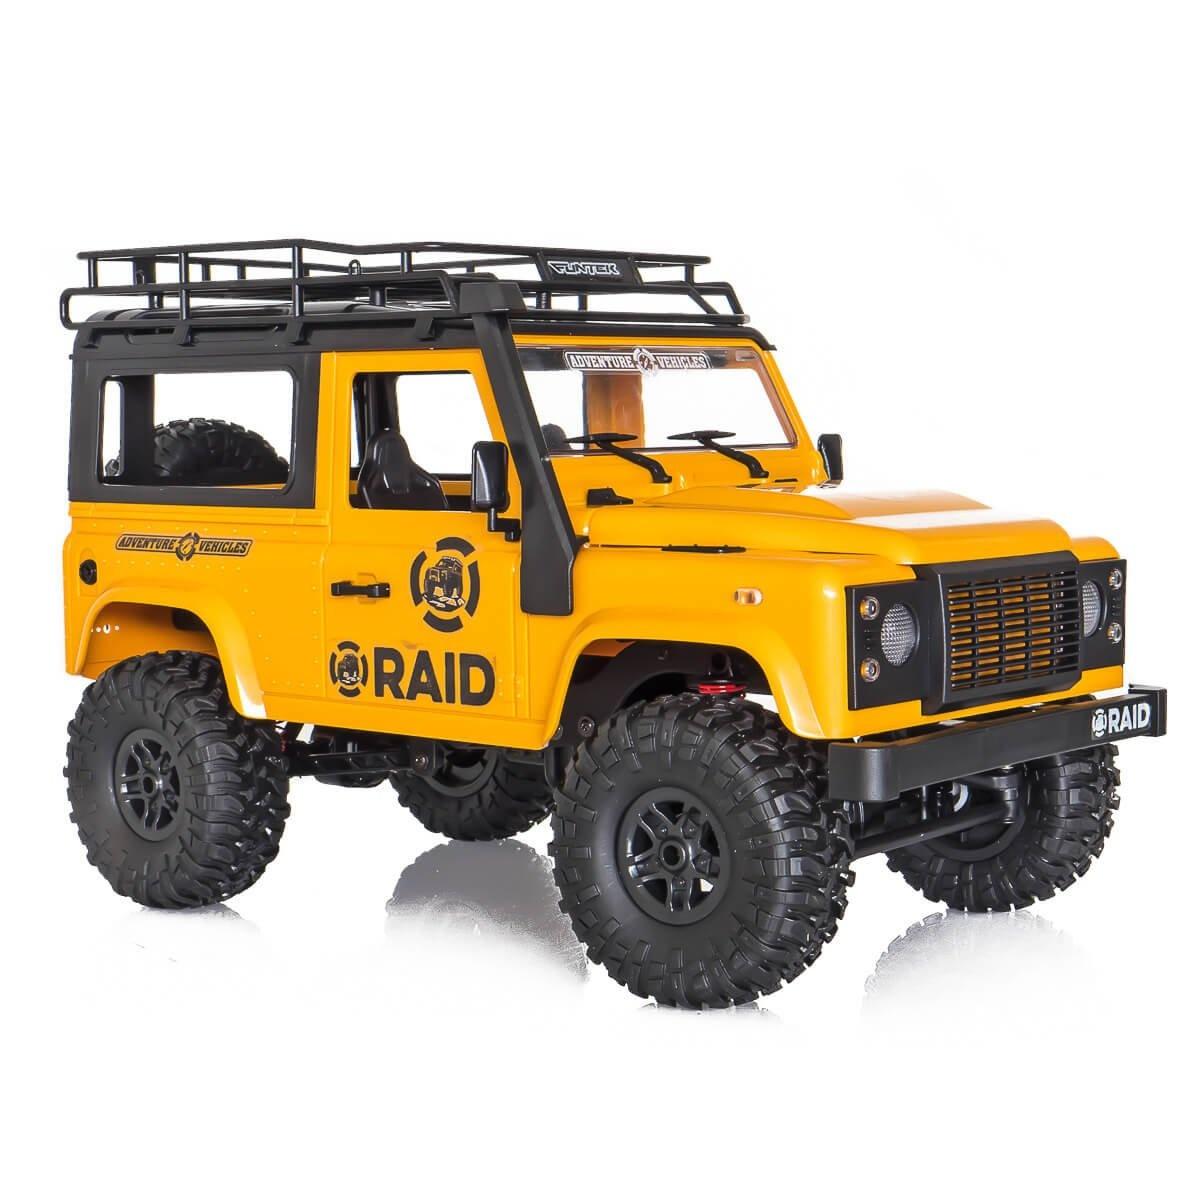 RAID ADVENTURE 4x4 Crawler 1:12 RTR (gelb)